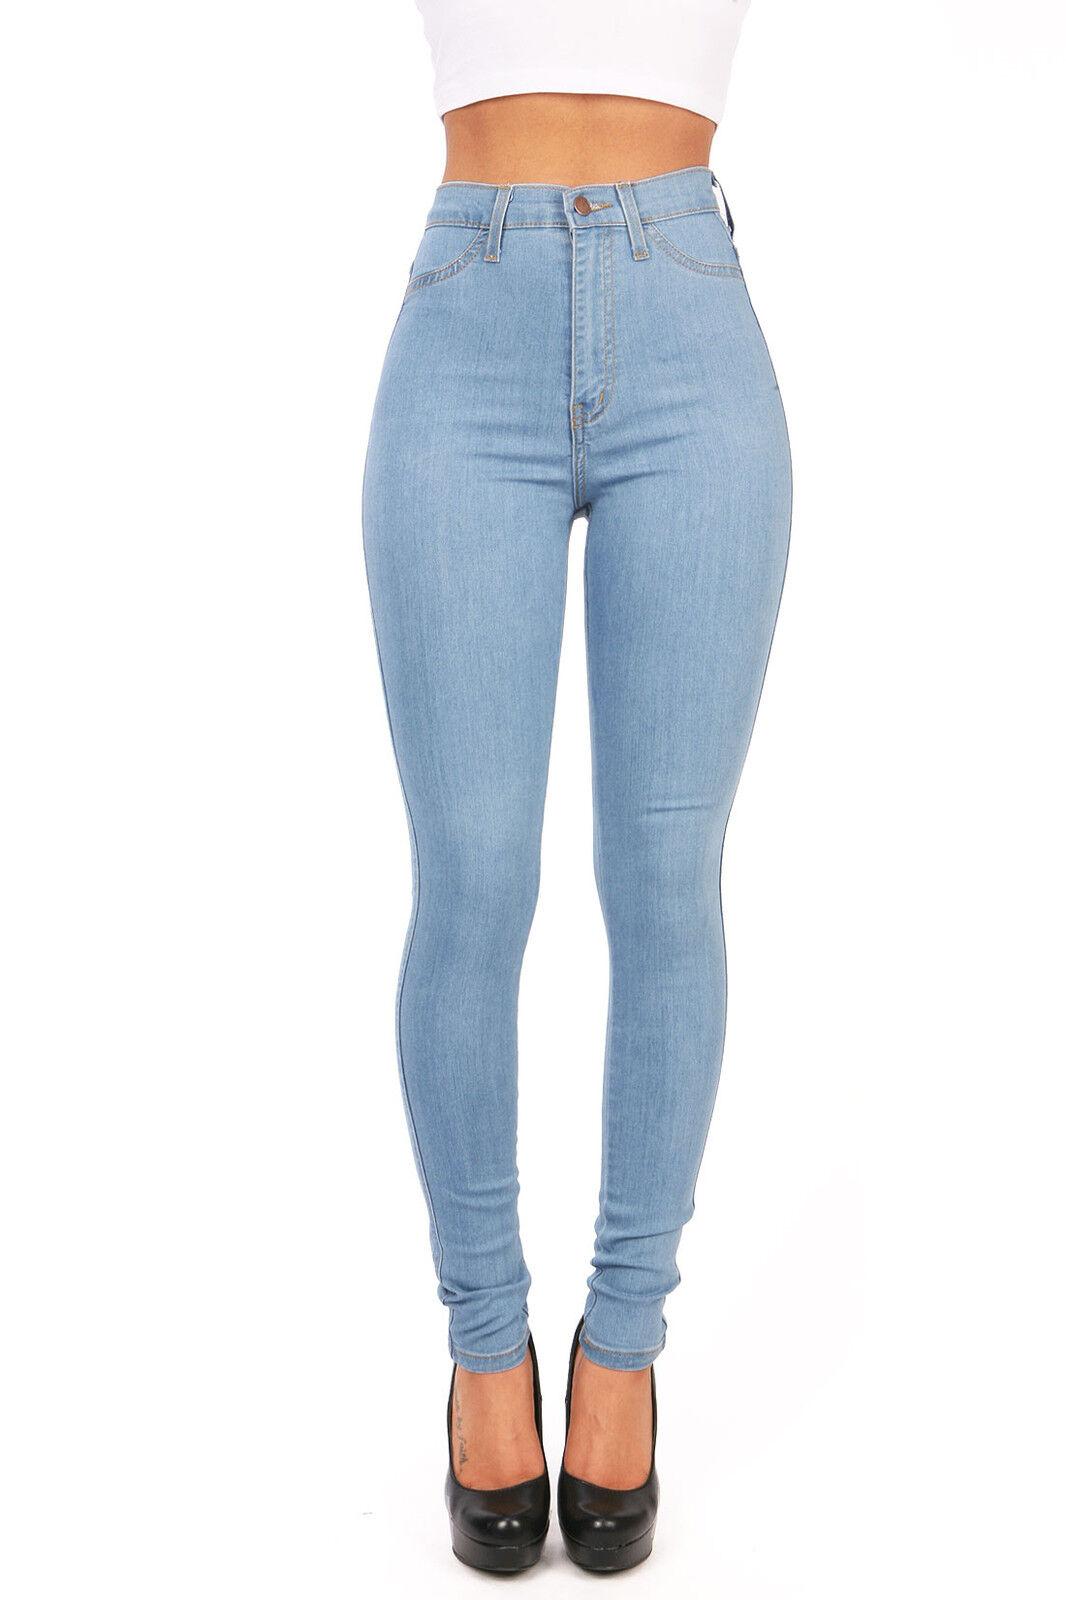 Vibrant Denim High Waist Womens Skinny Jeans High Waisted Skinnys Long Pants USA